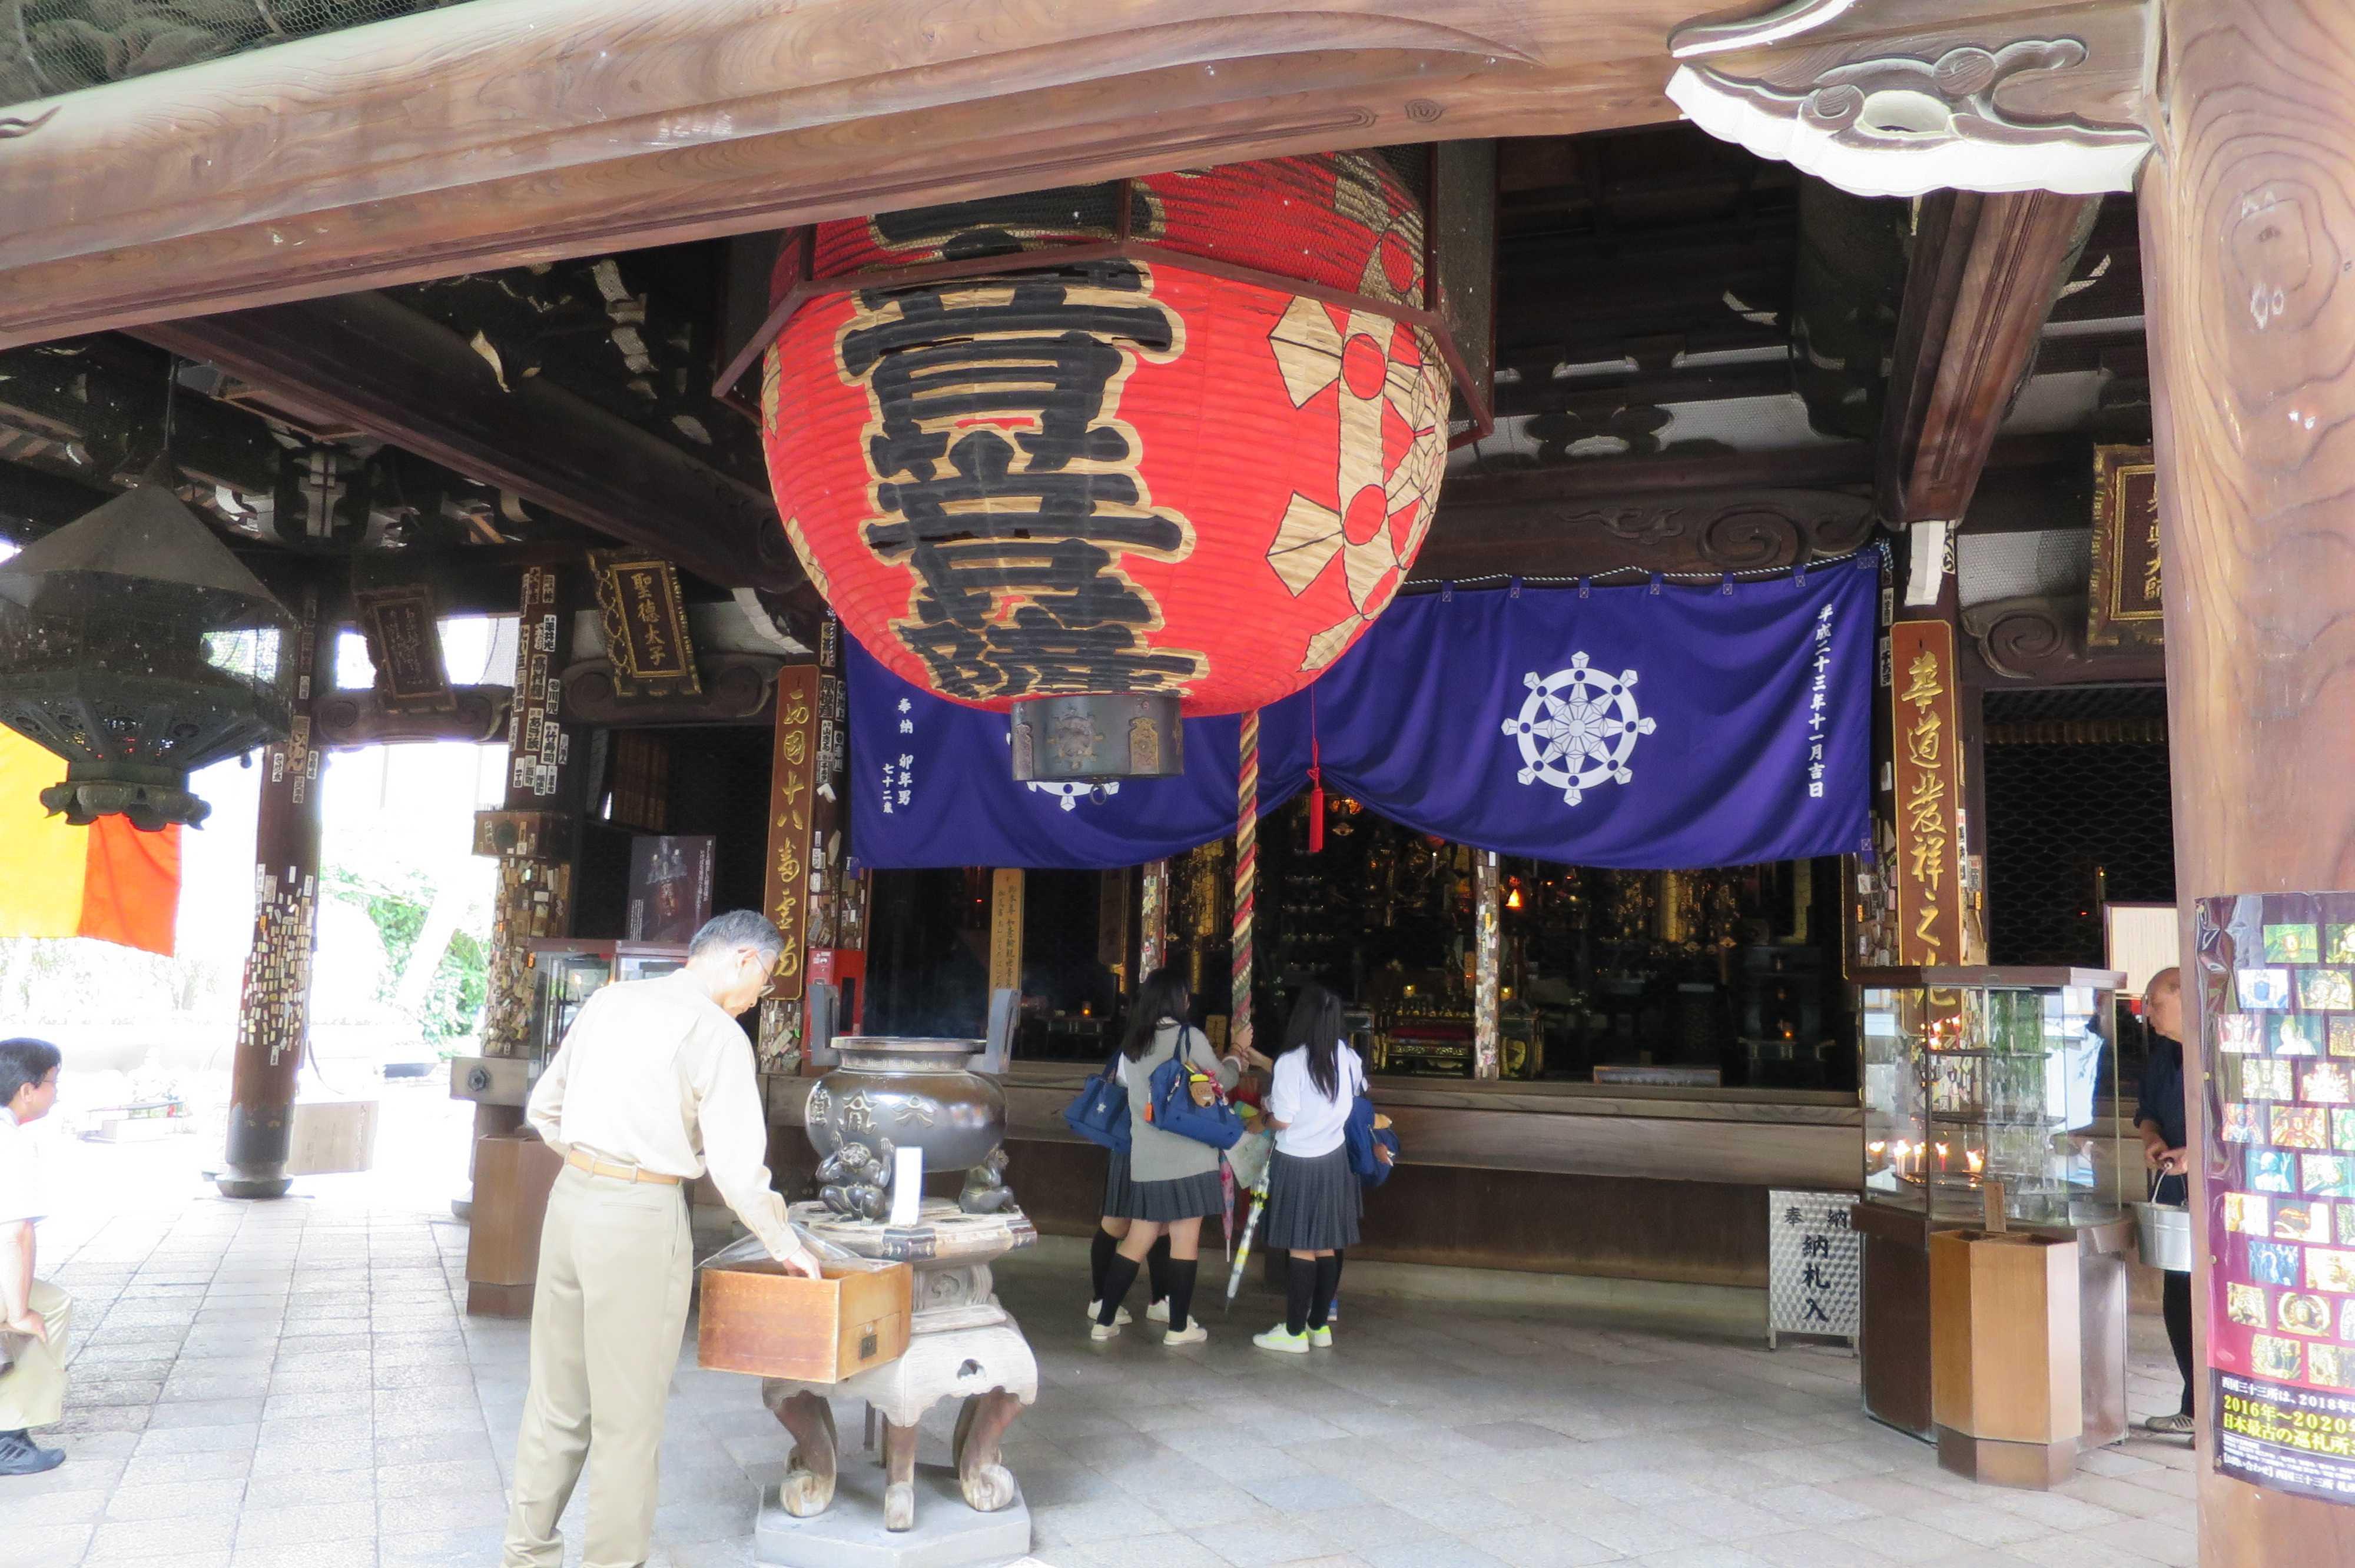 京都・六角堂 - 修学旅行の女子高生のご参拝